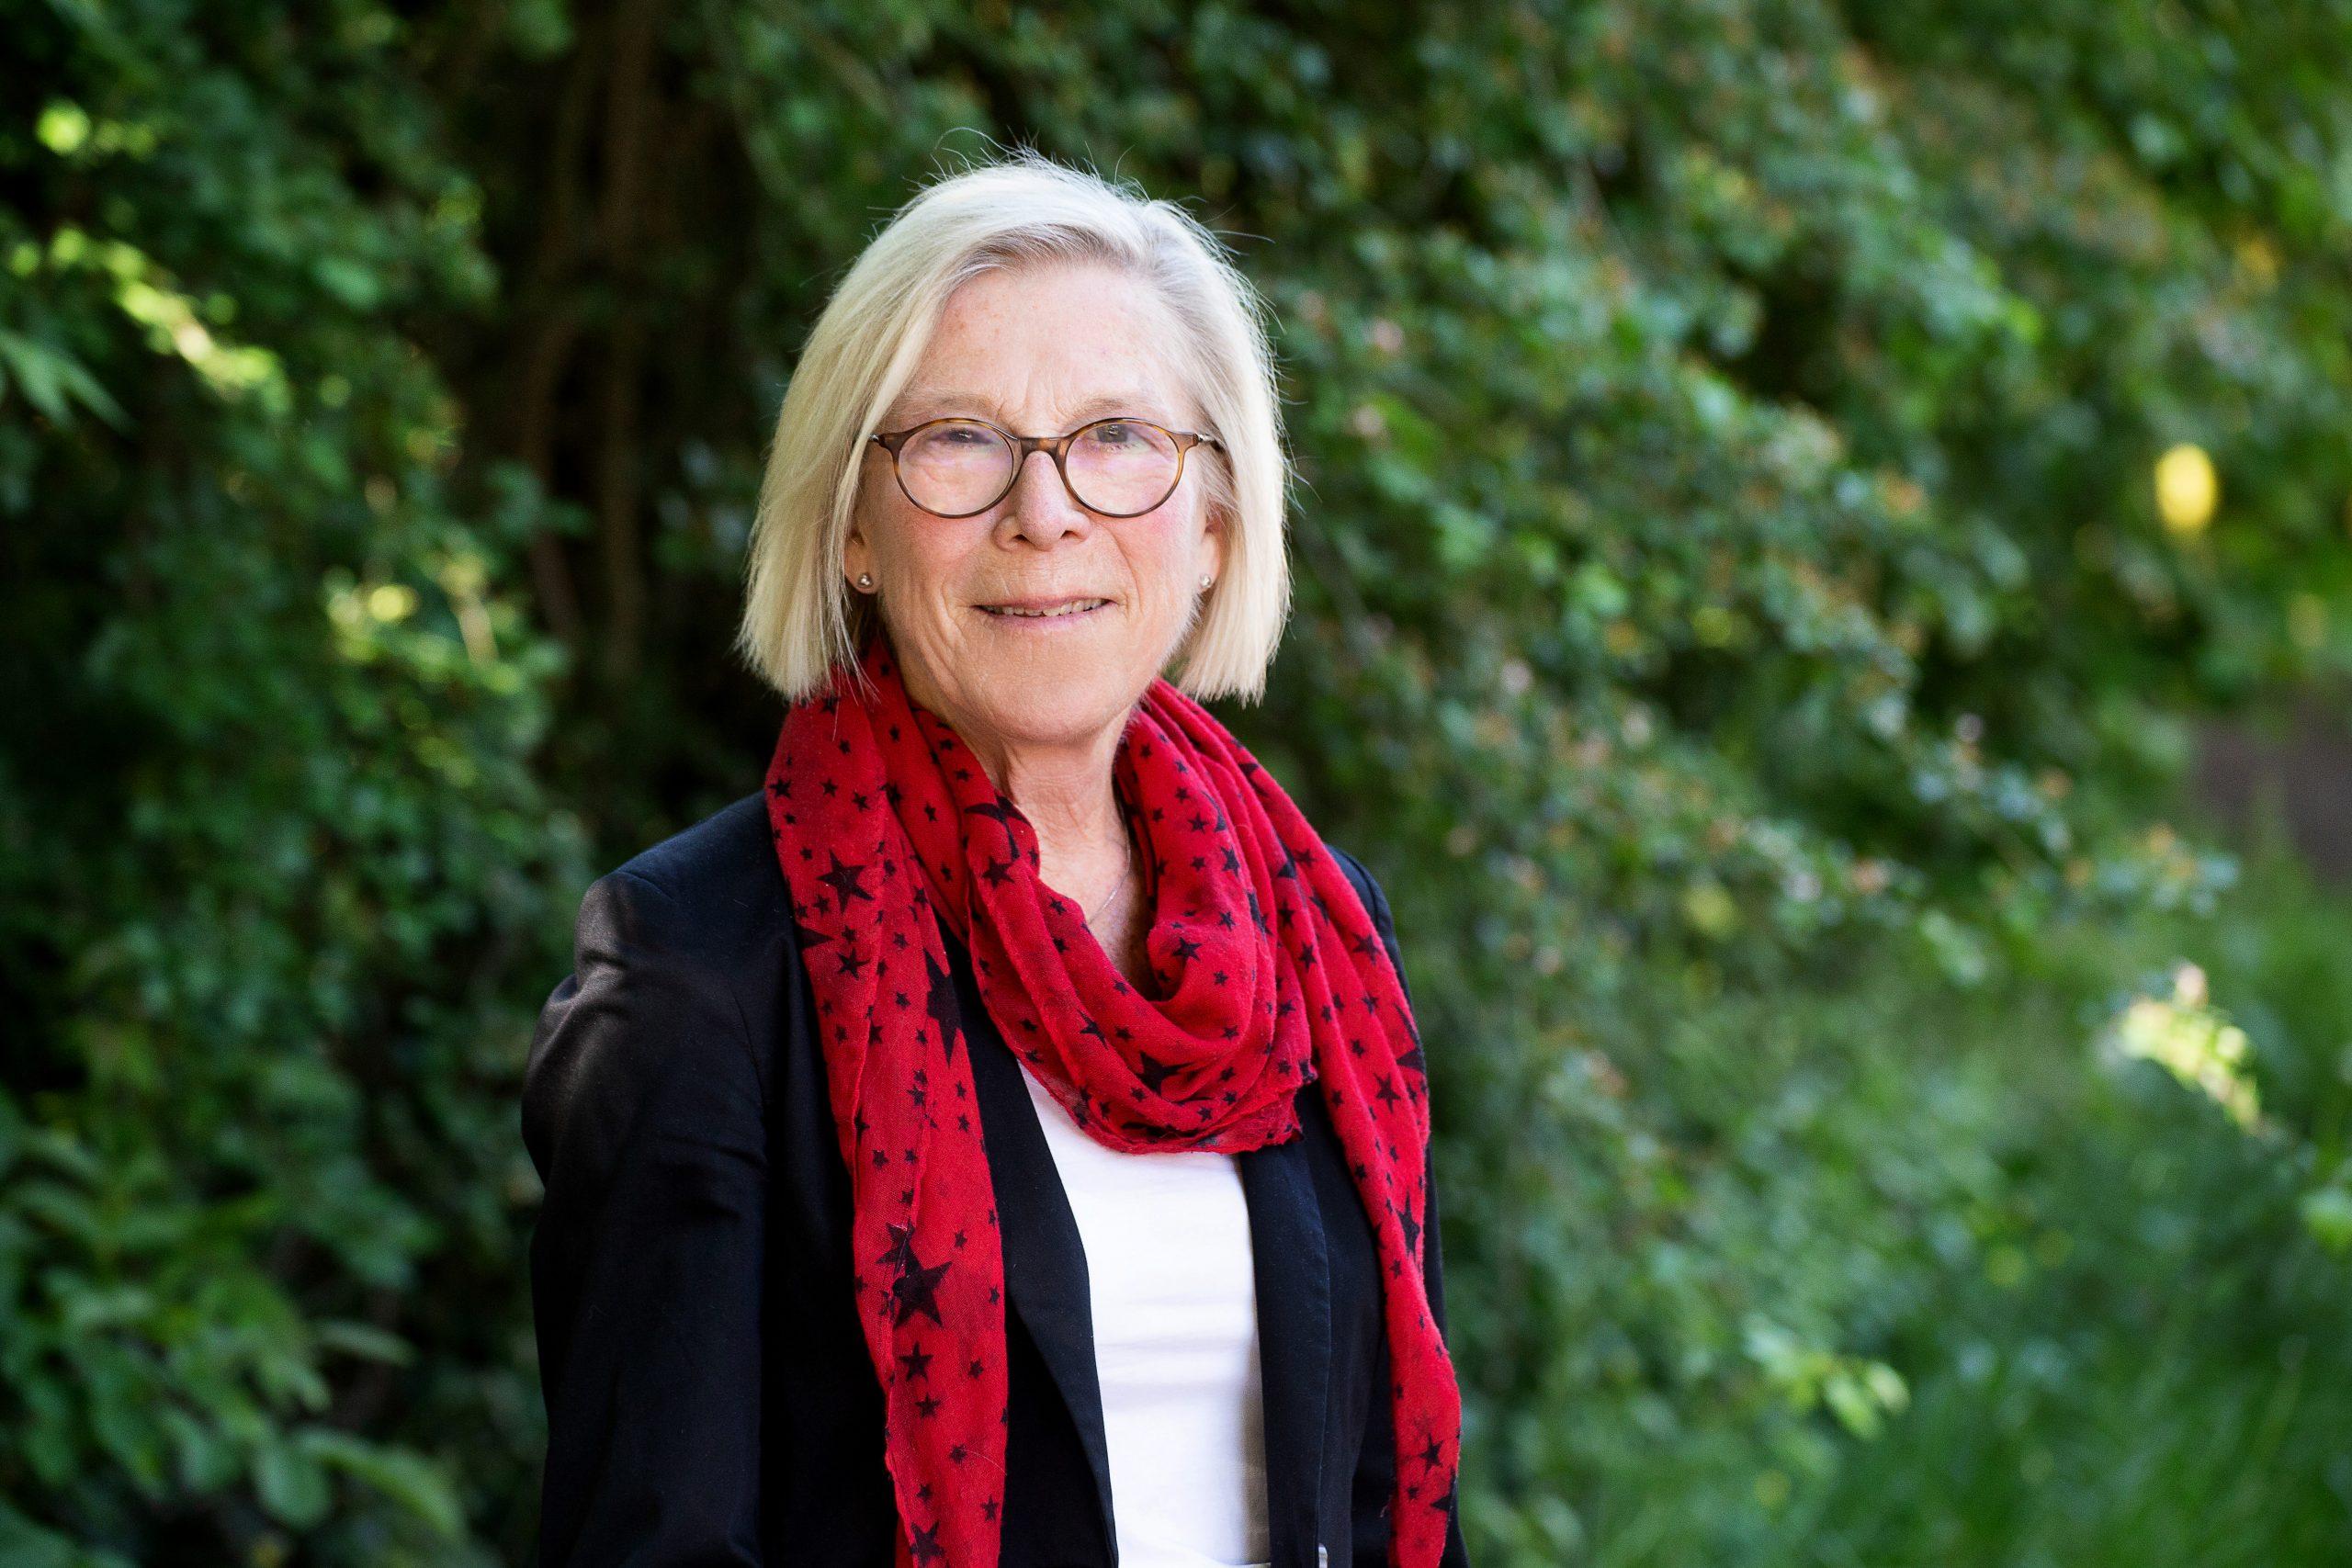 Brigitte Cziehso